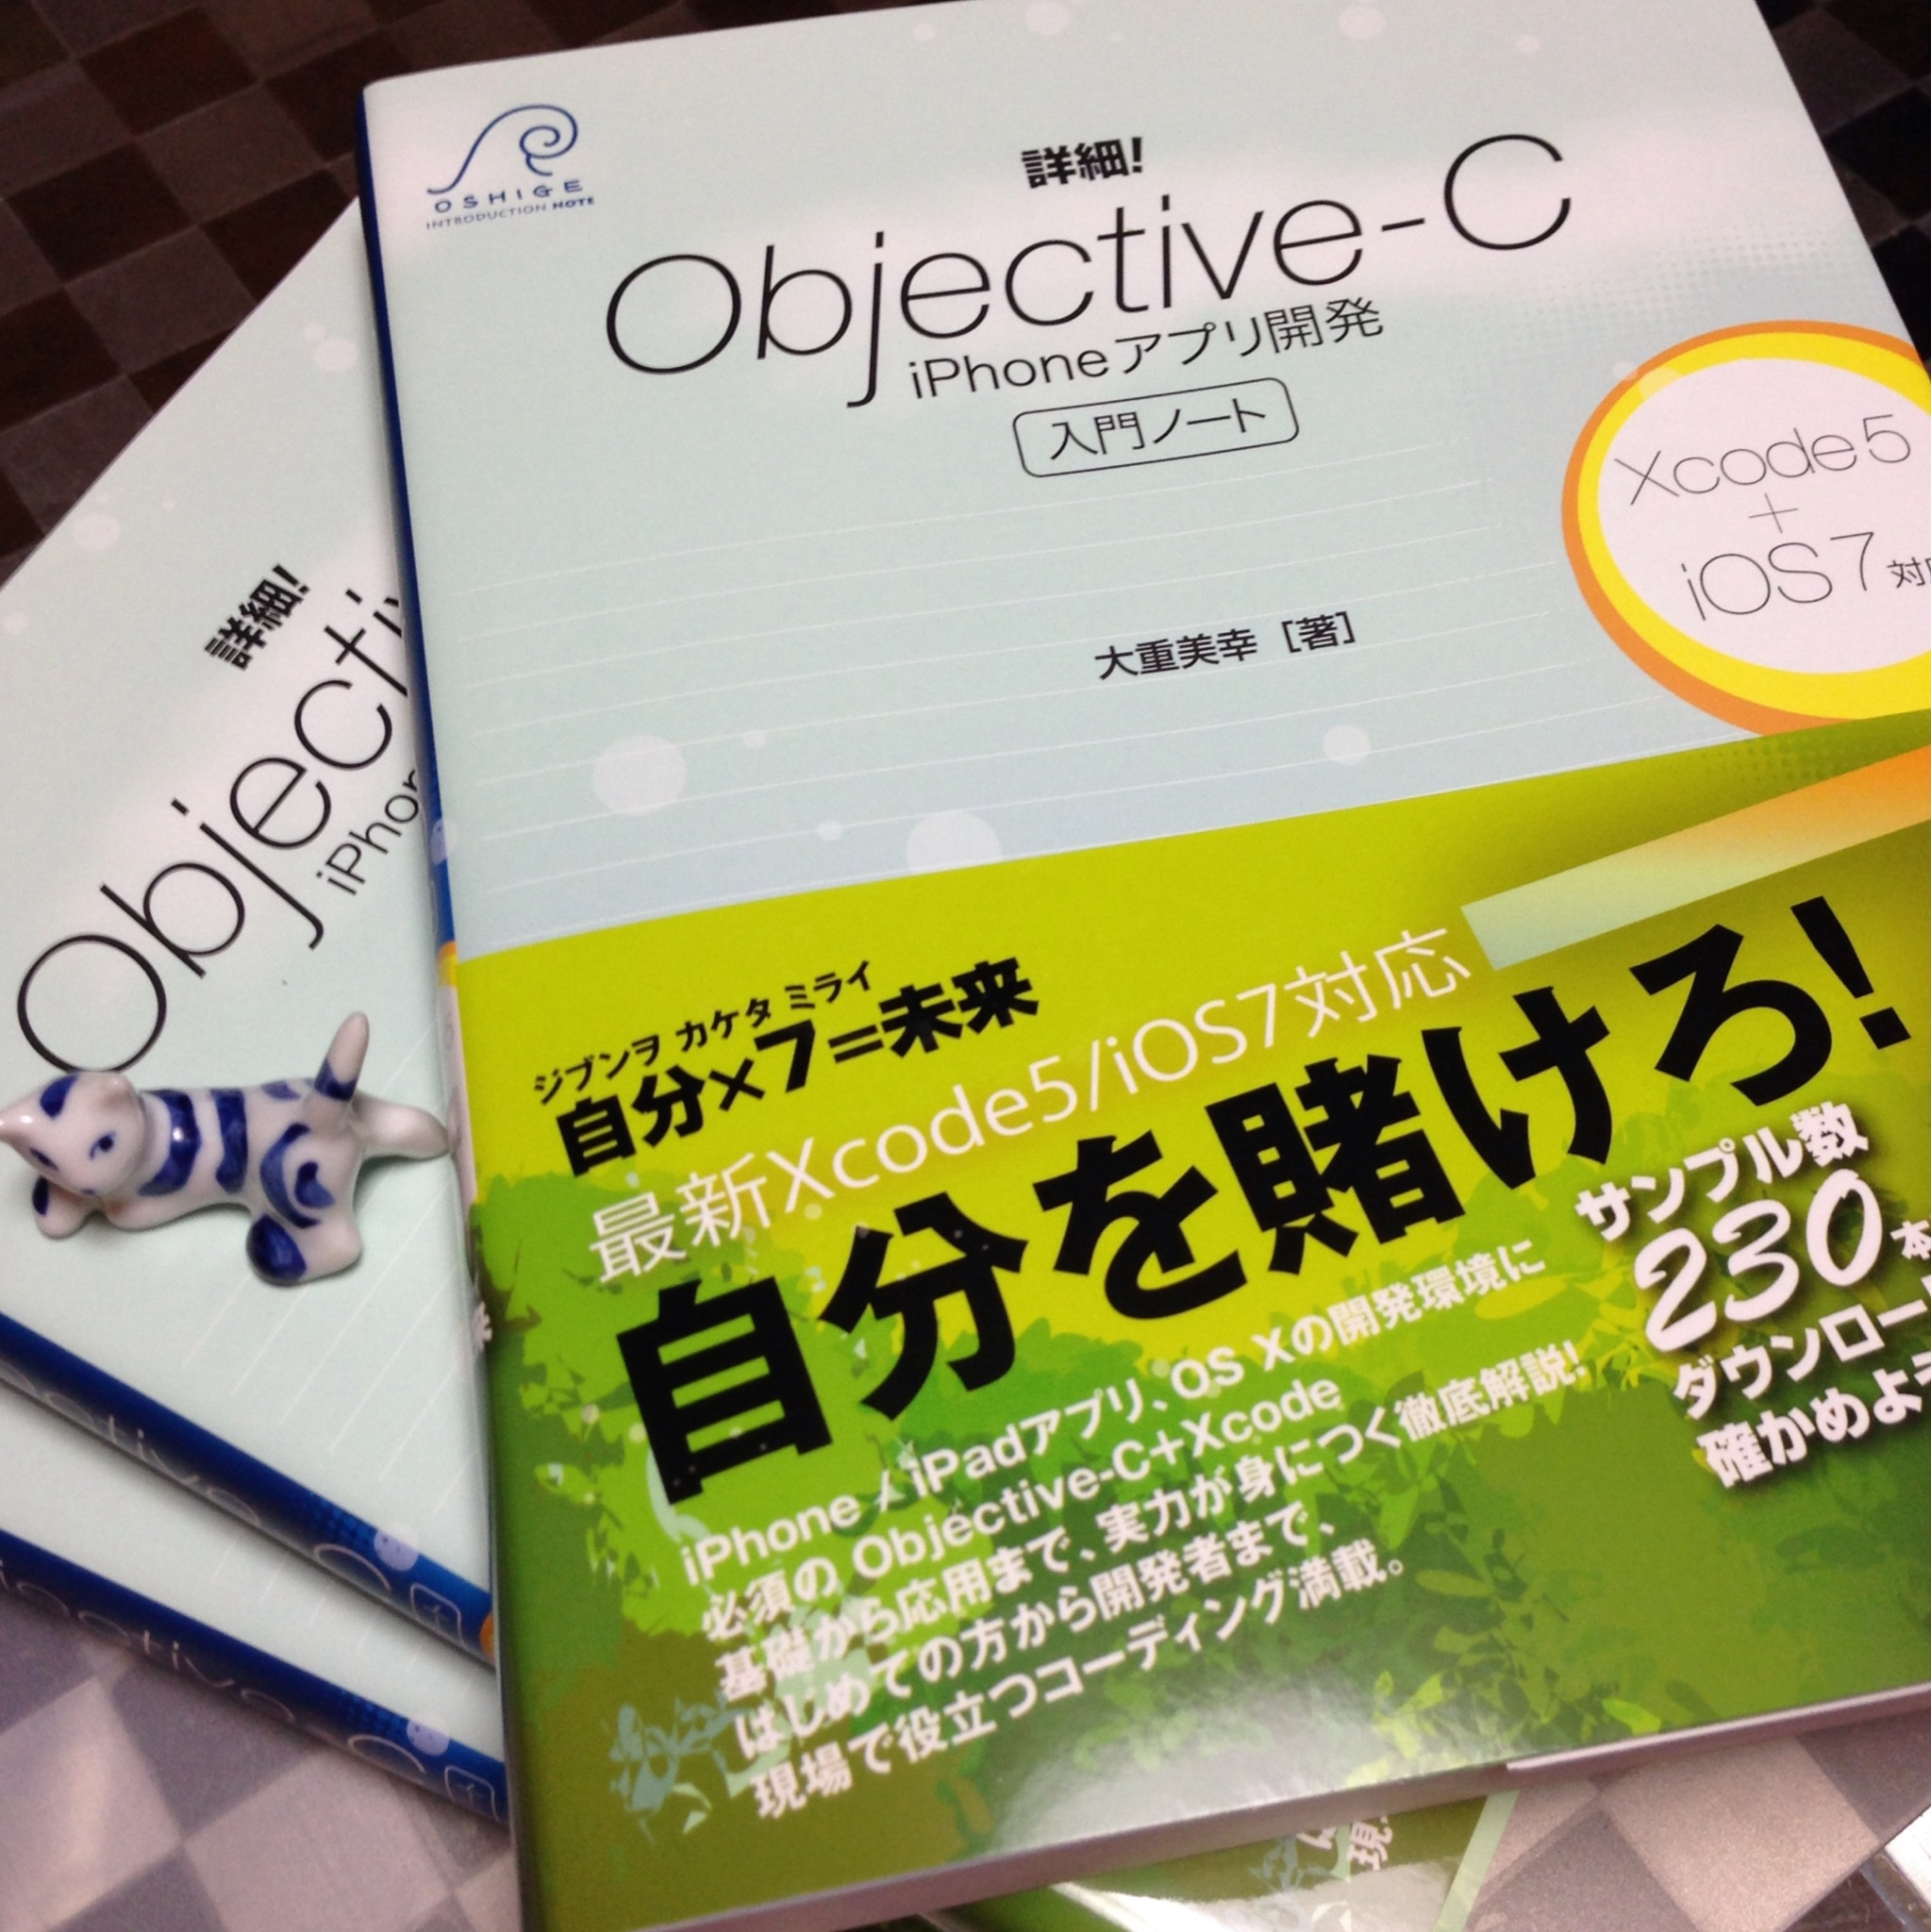 http://oshige.com/blog/index/images/bc9833ec9d37619708be37797969b46c55e570b0.jpg